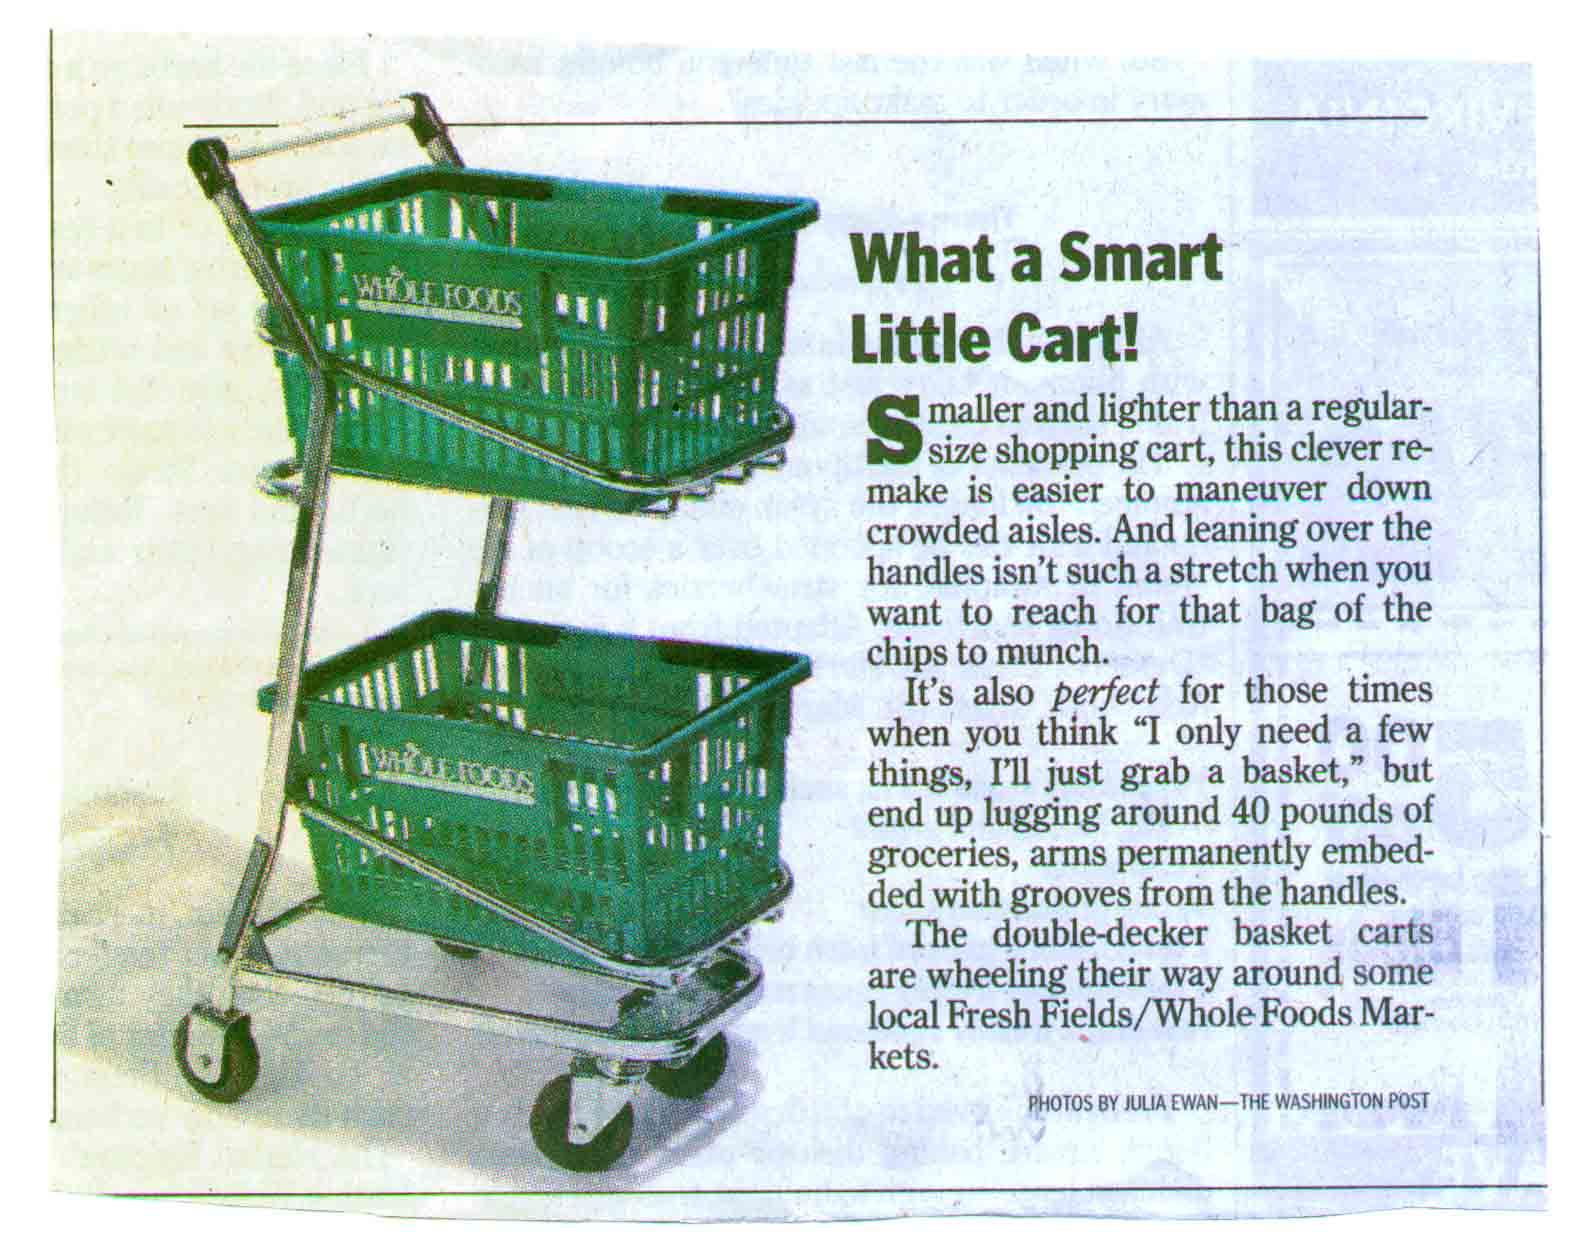 Smart Little Cart - EZcart Washington Post Article